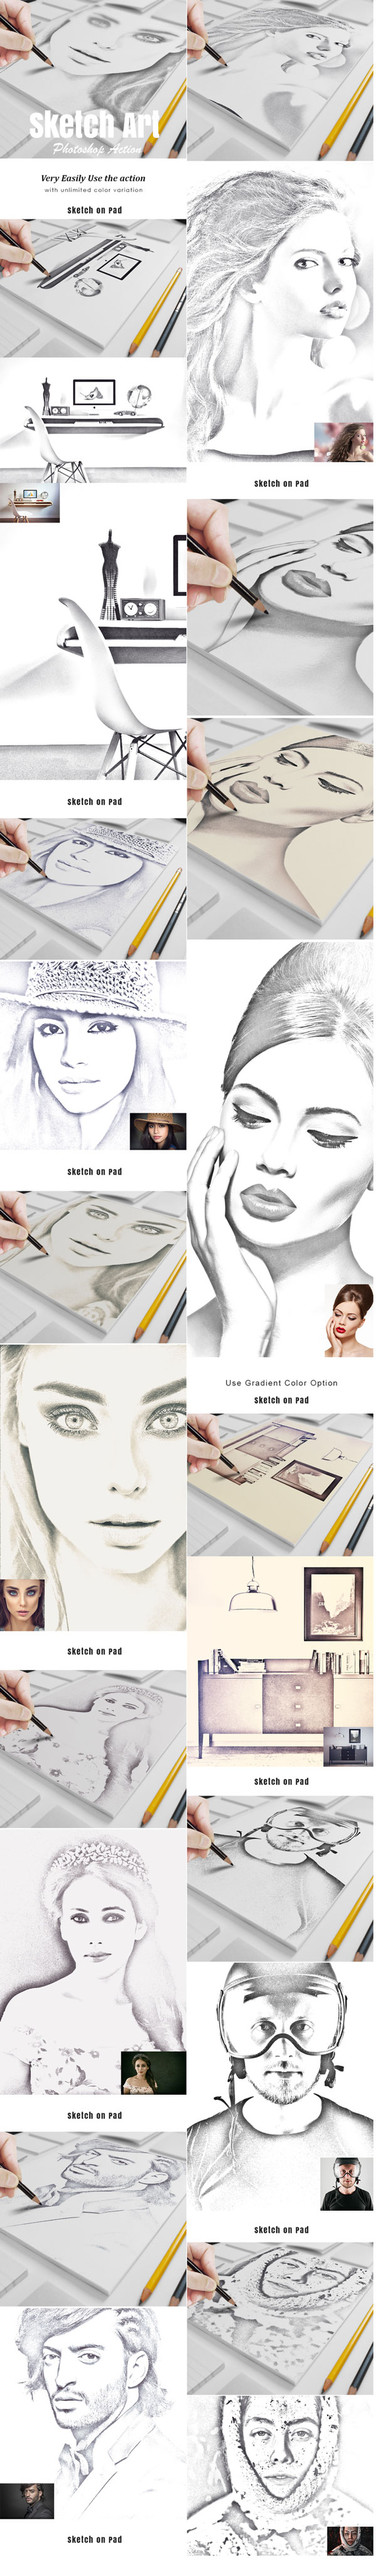 Sketch Art Effect Photo Action